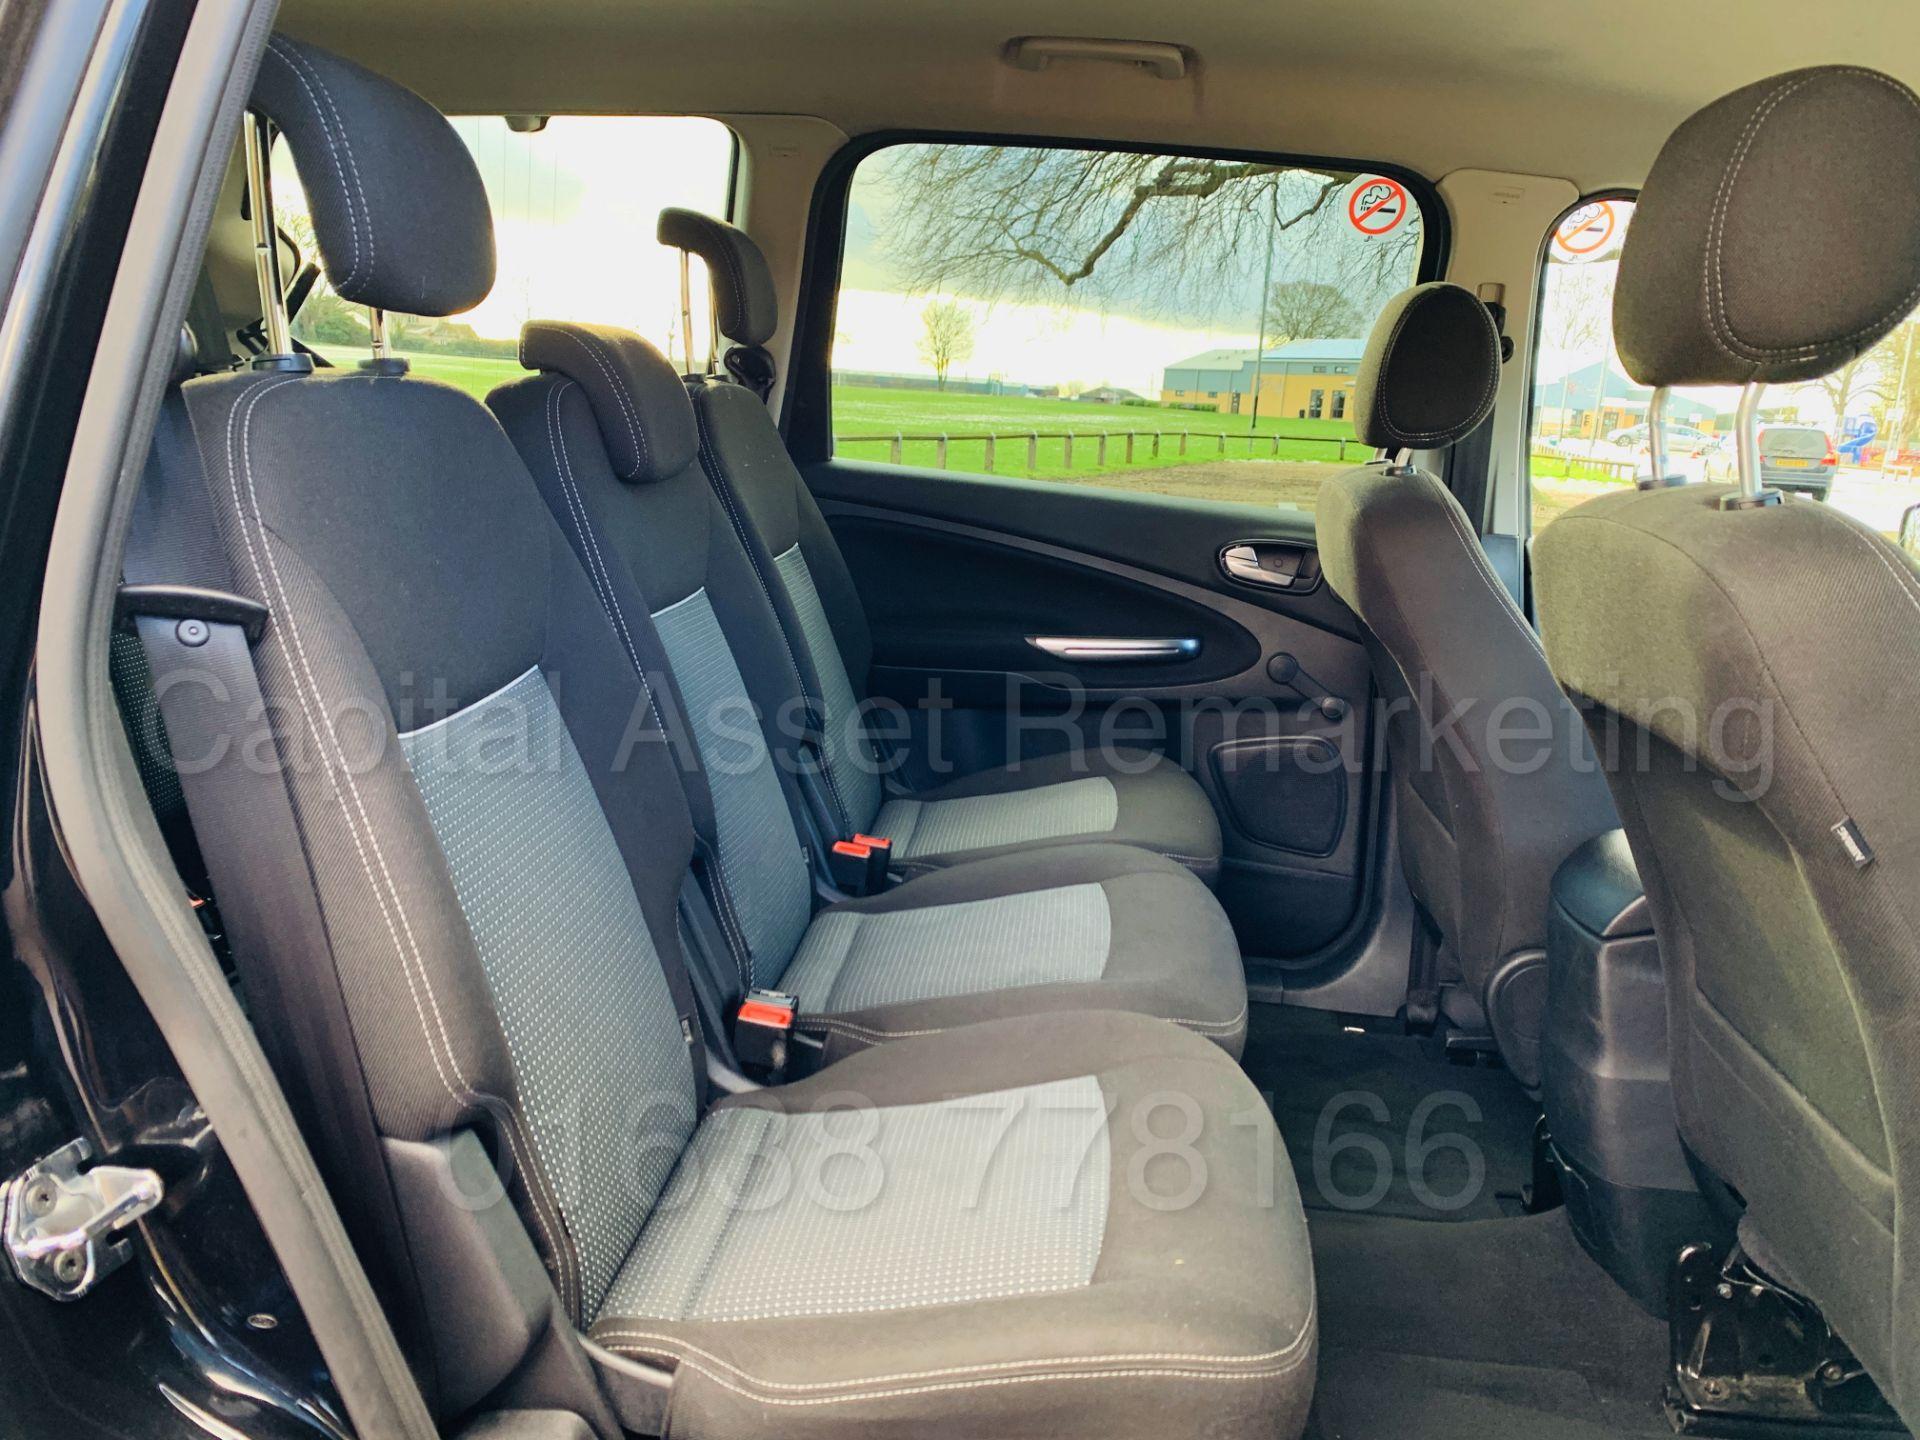 Lot 10A - FORD GALAXY **ZETEC** 7 SEATER MPV (2015 MODEL) 2.0 TDCI - 140 BHP - AUTO POWER SHIFT (1 OWNER)